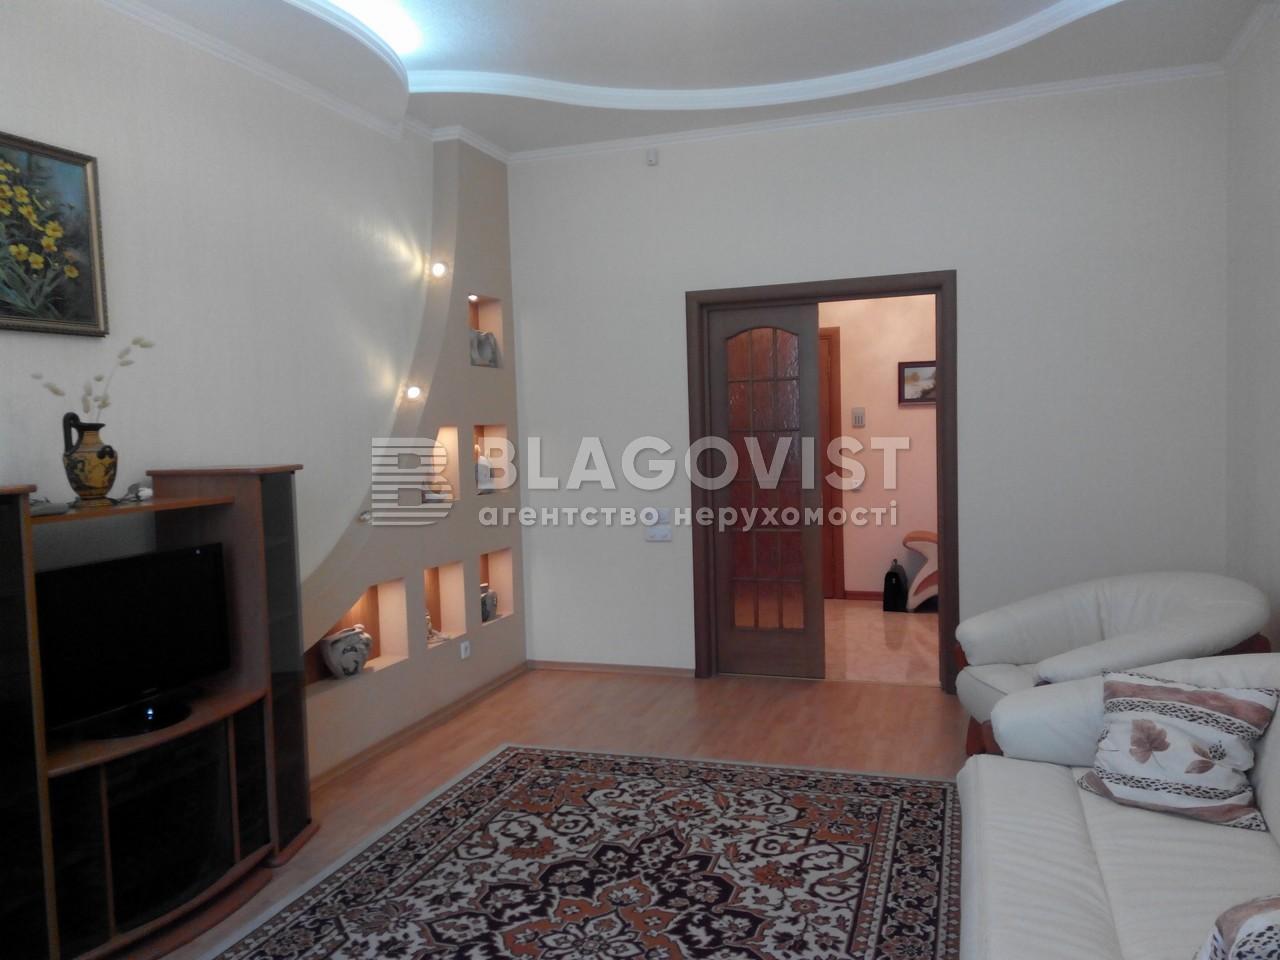 Квартира F-7298, Героев Сталинграда просп., 10а, Киев - Фото 6